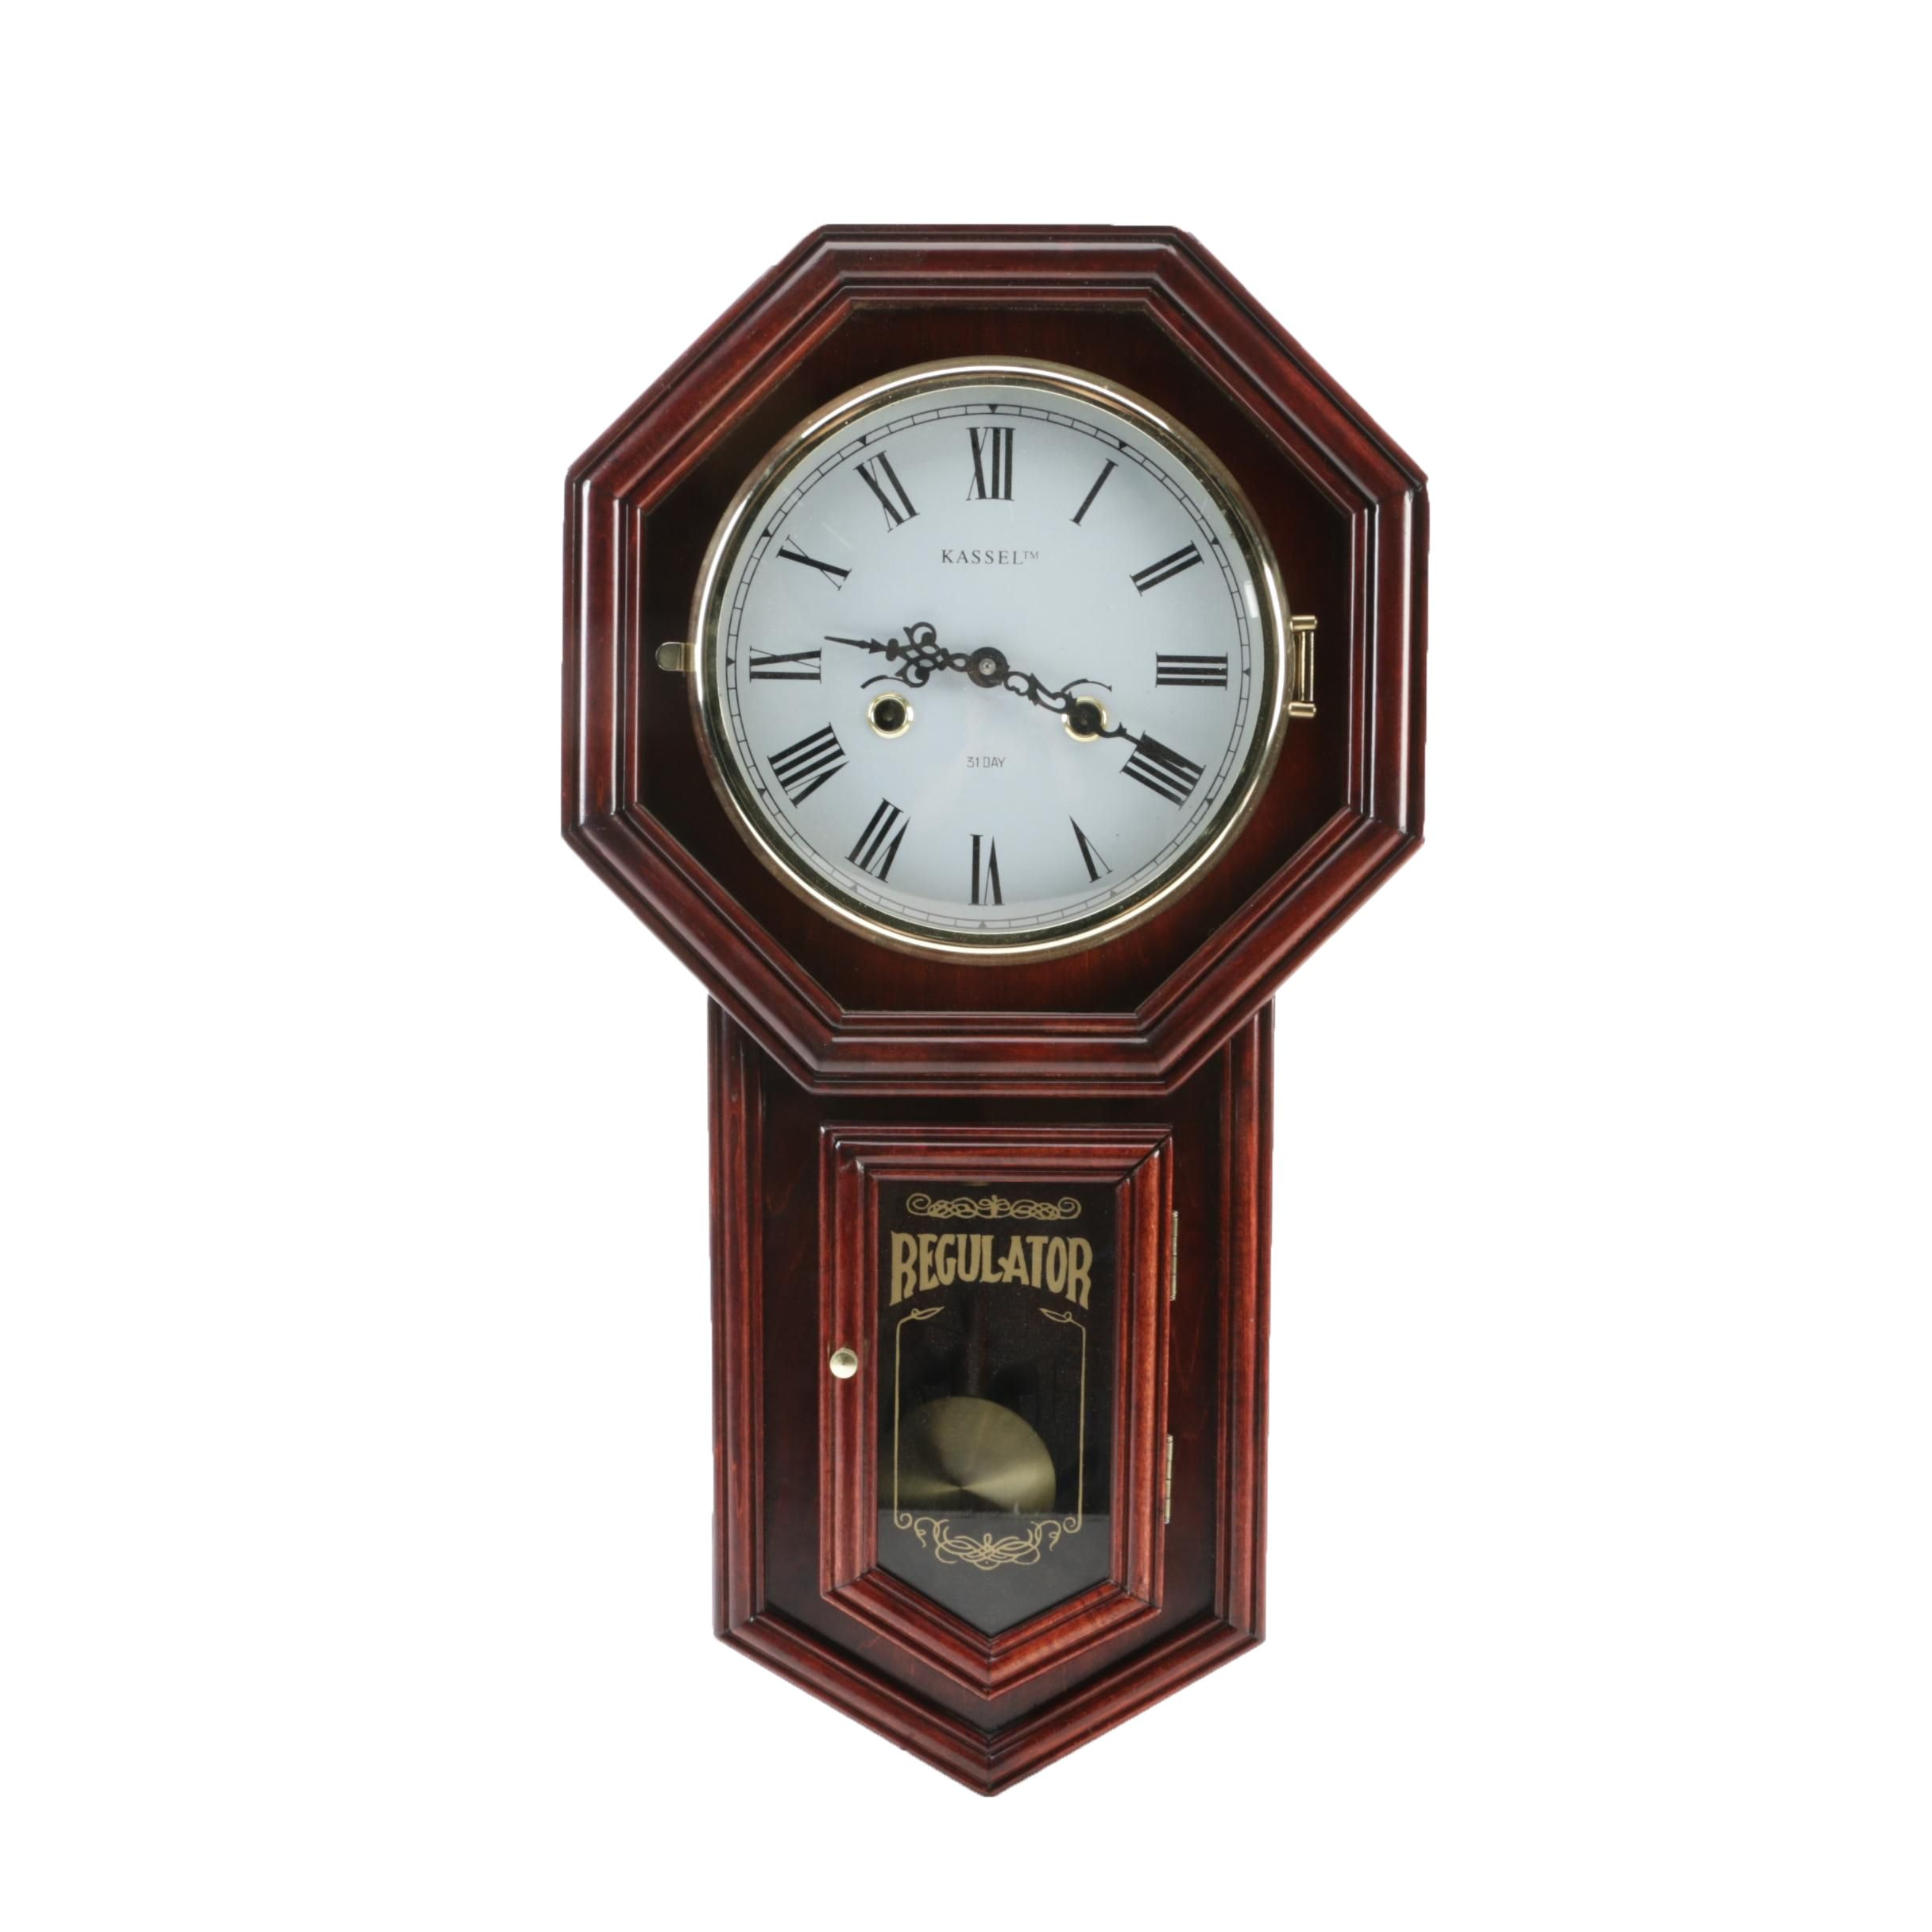 Vintage Kassel Regulator Wall Clock